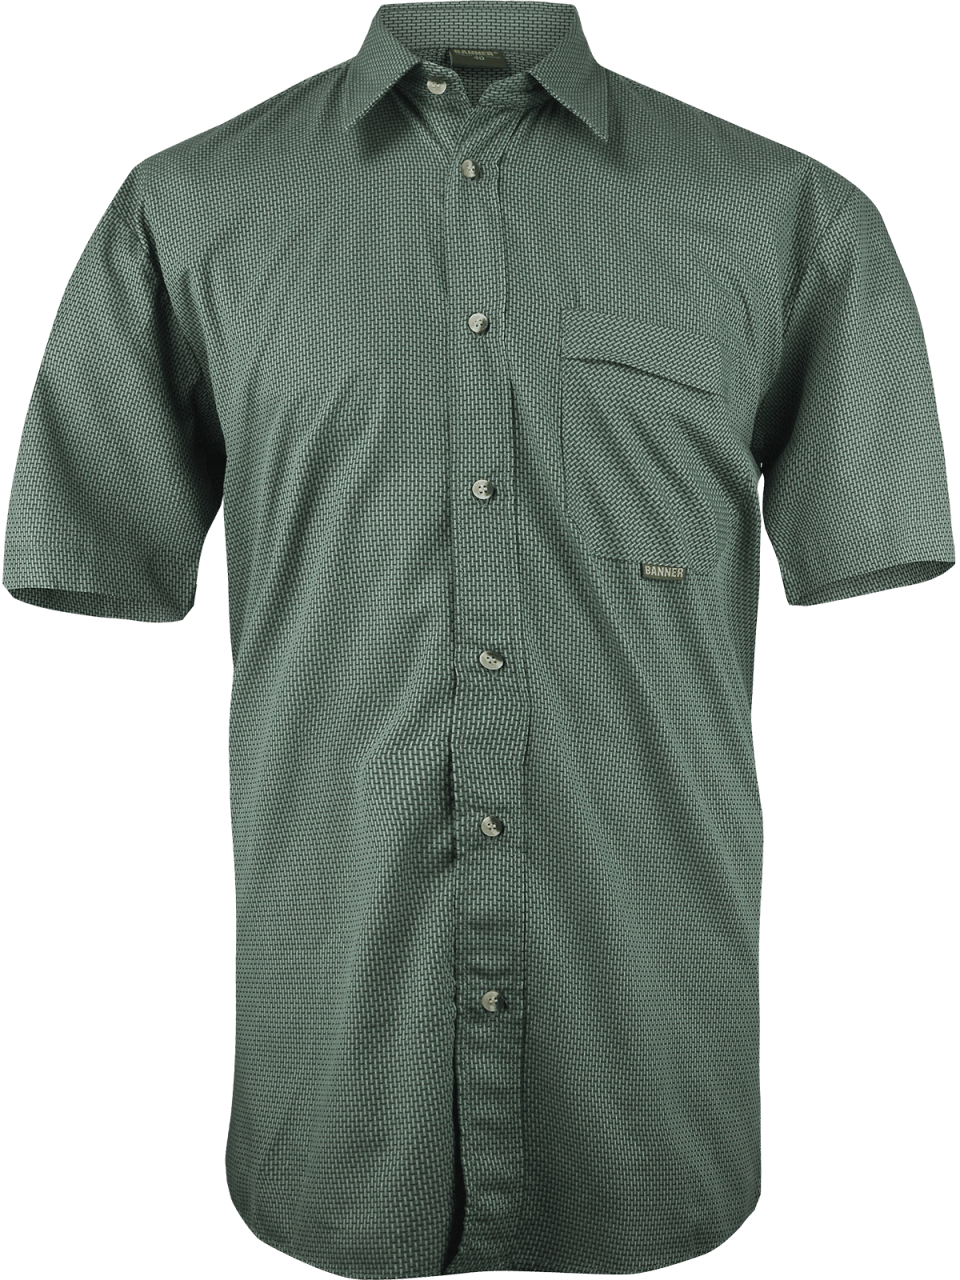 košeľa Artela KR 1